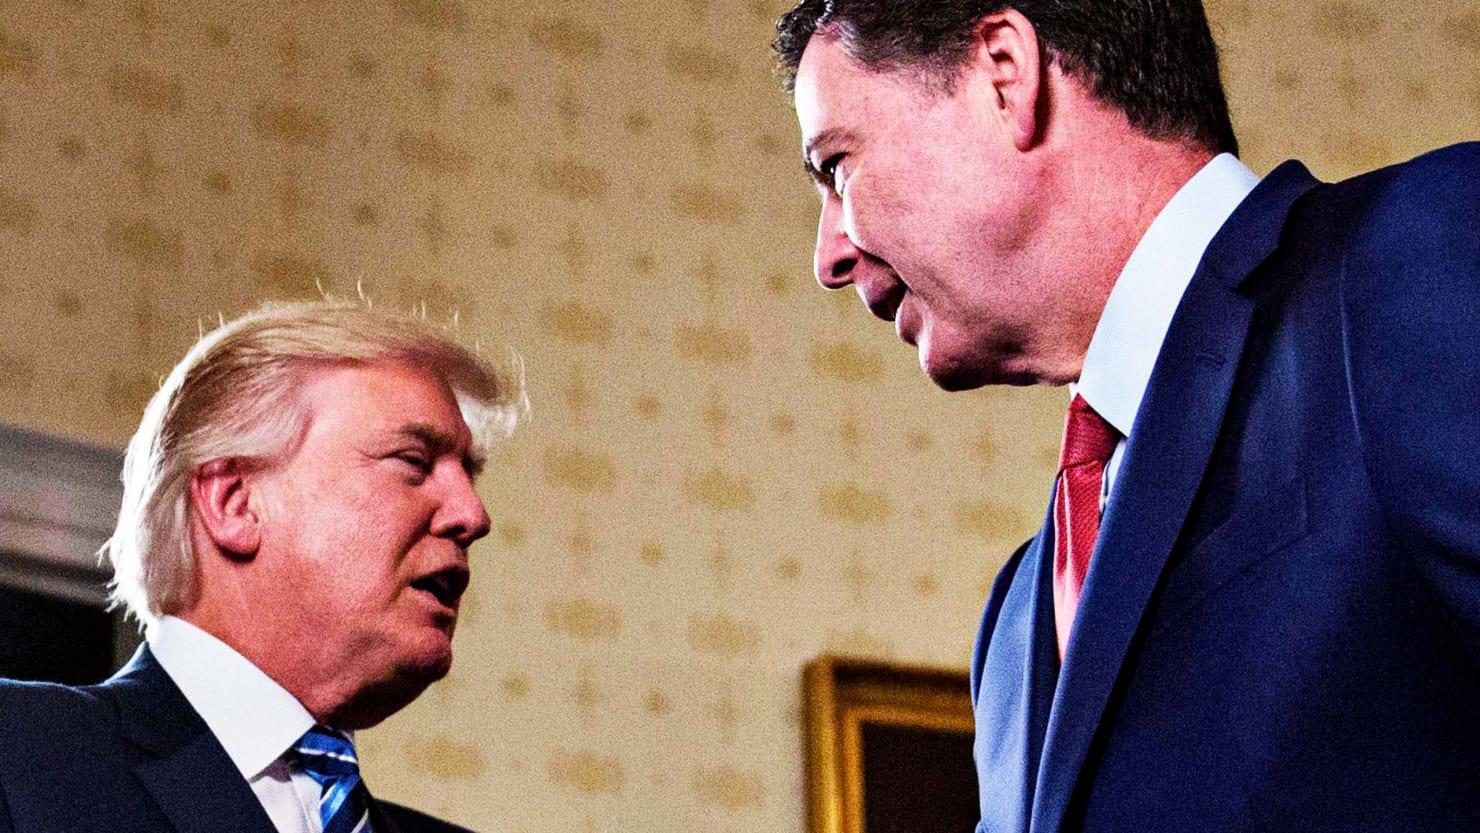 Дональд Трамп и Джеймс Коми. Фото: thedailybeast.com